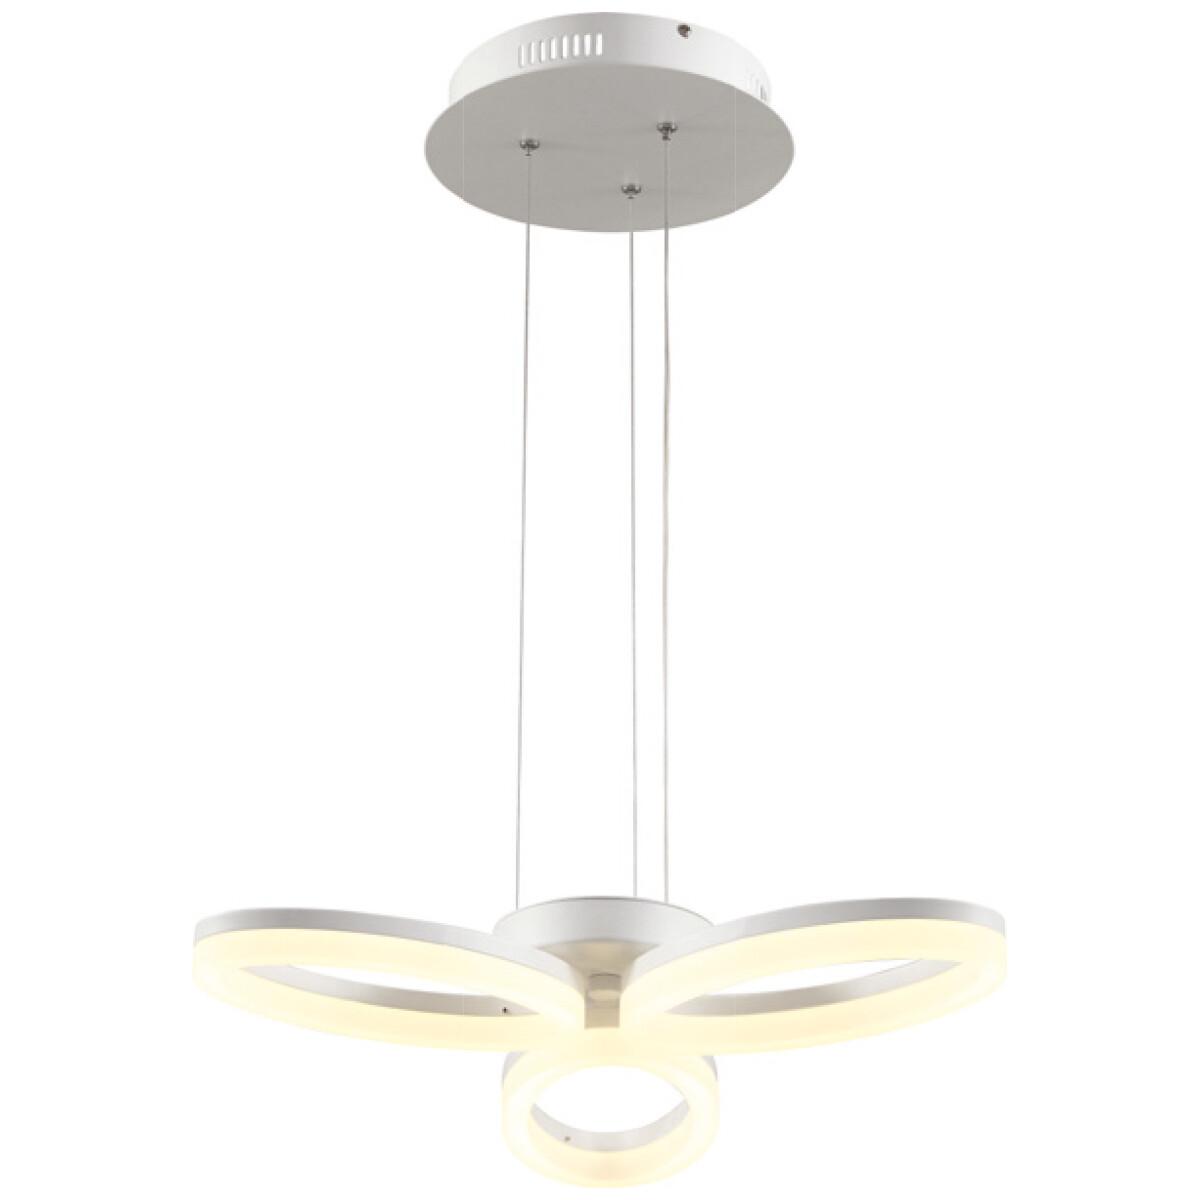 LED Plafondlamp - Plafondverlichting - Luxury - 24W - Natuurlijk Wit 4000K - Wit Aluminium